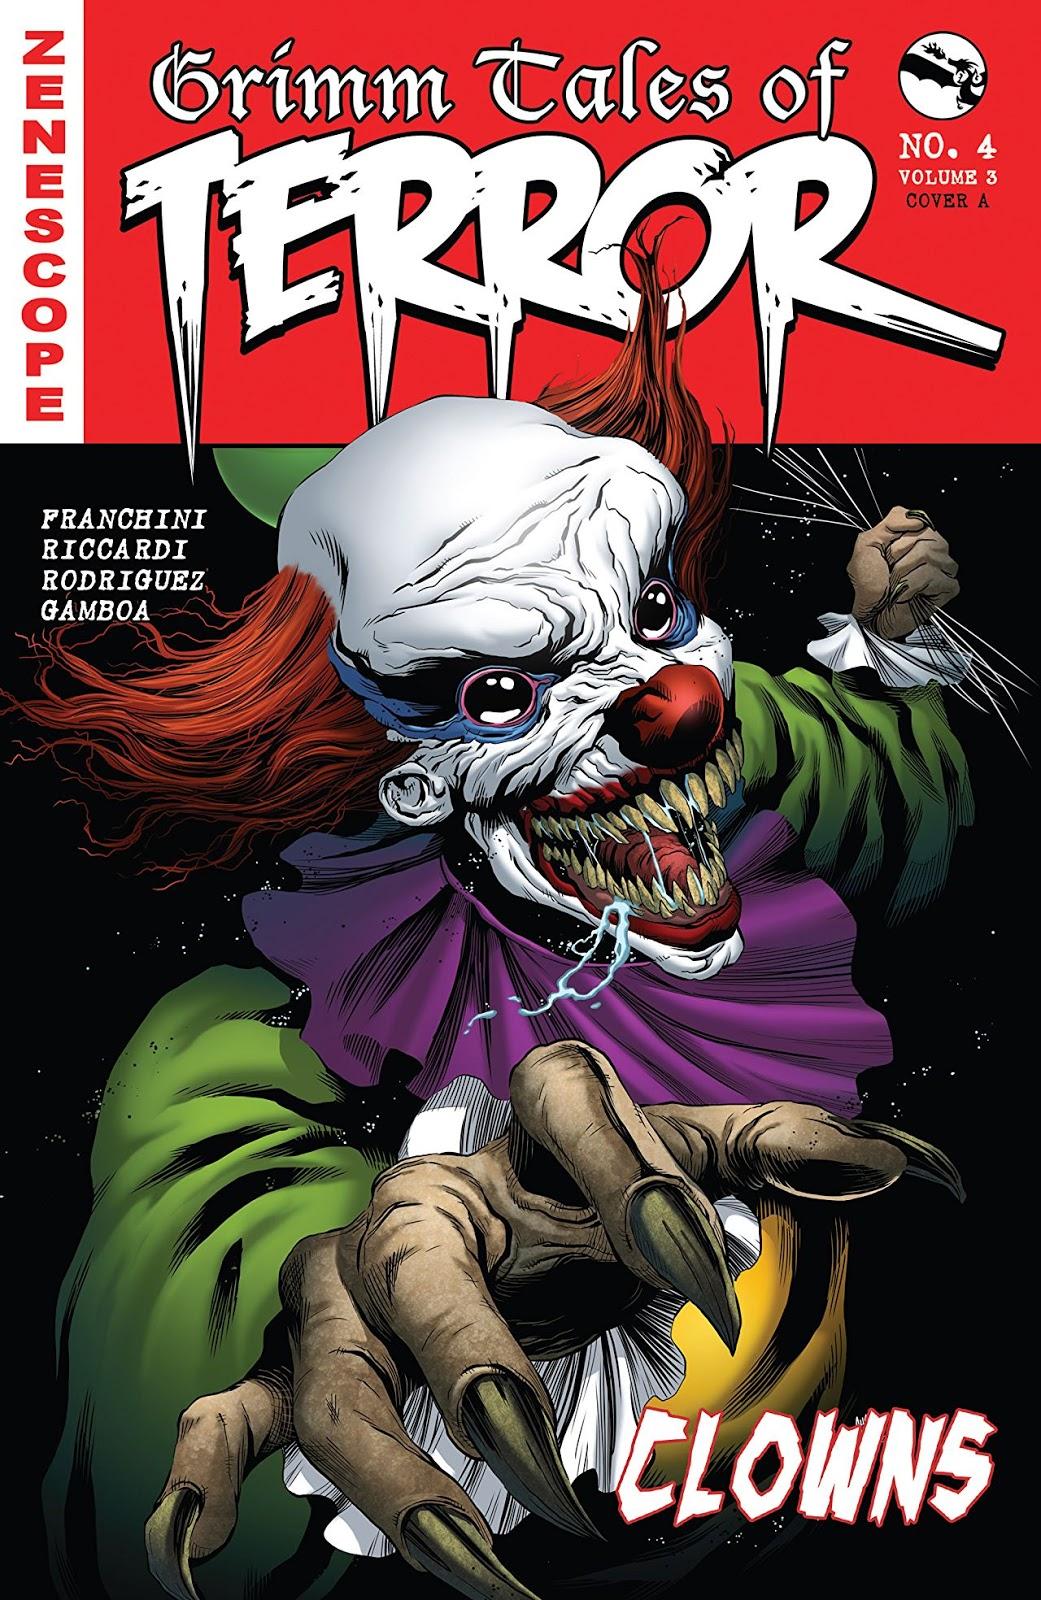 Action Comics 977 2017 Webrip The Last Kryptonian Dcp Cbr Size 40 7 Mb S6 Postimg Org Rg3katpup Action_comics_977_2017_webrip_the_last_kryp